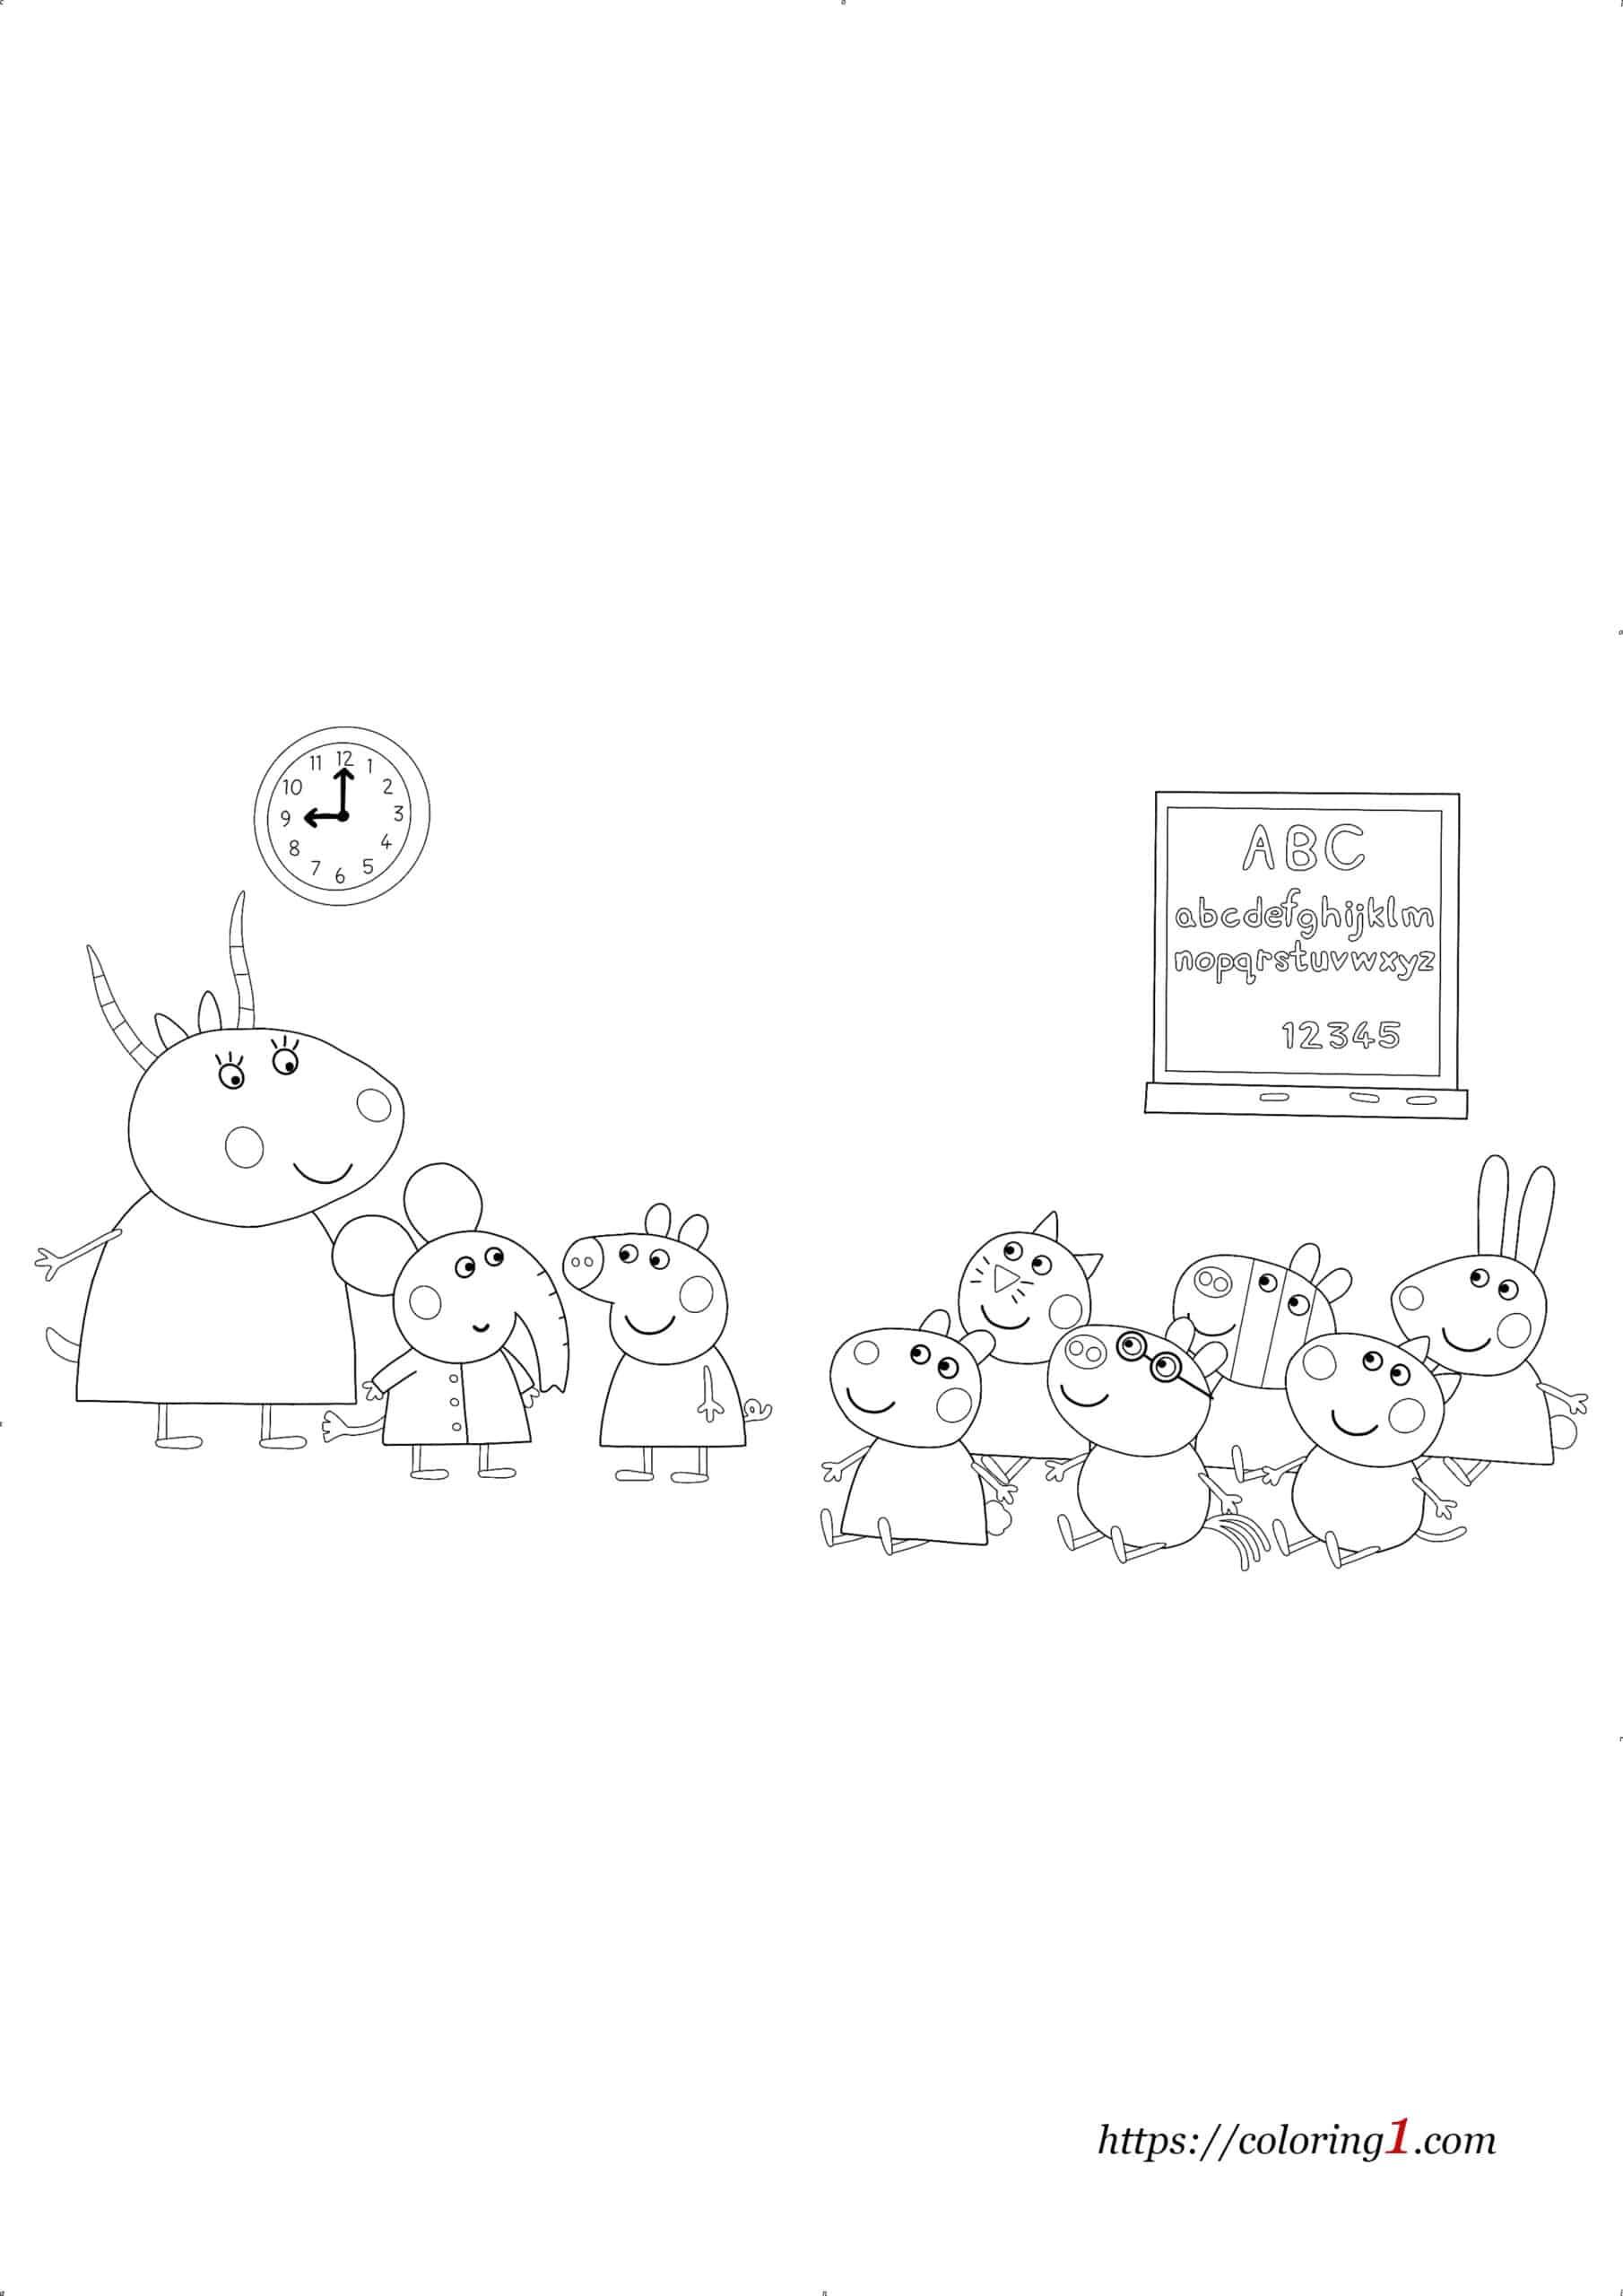 Peppa Pig School coloring page